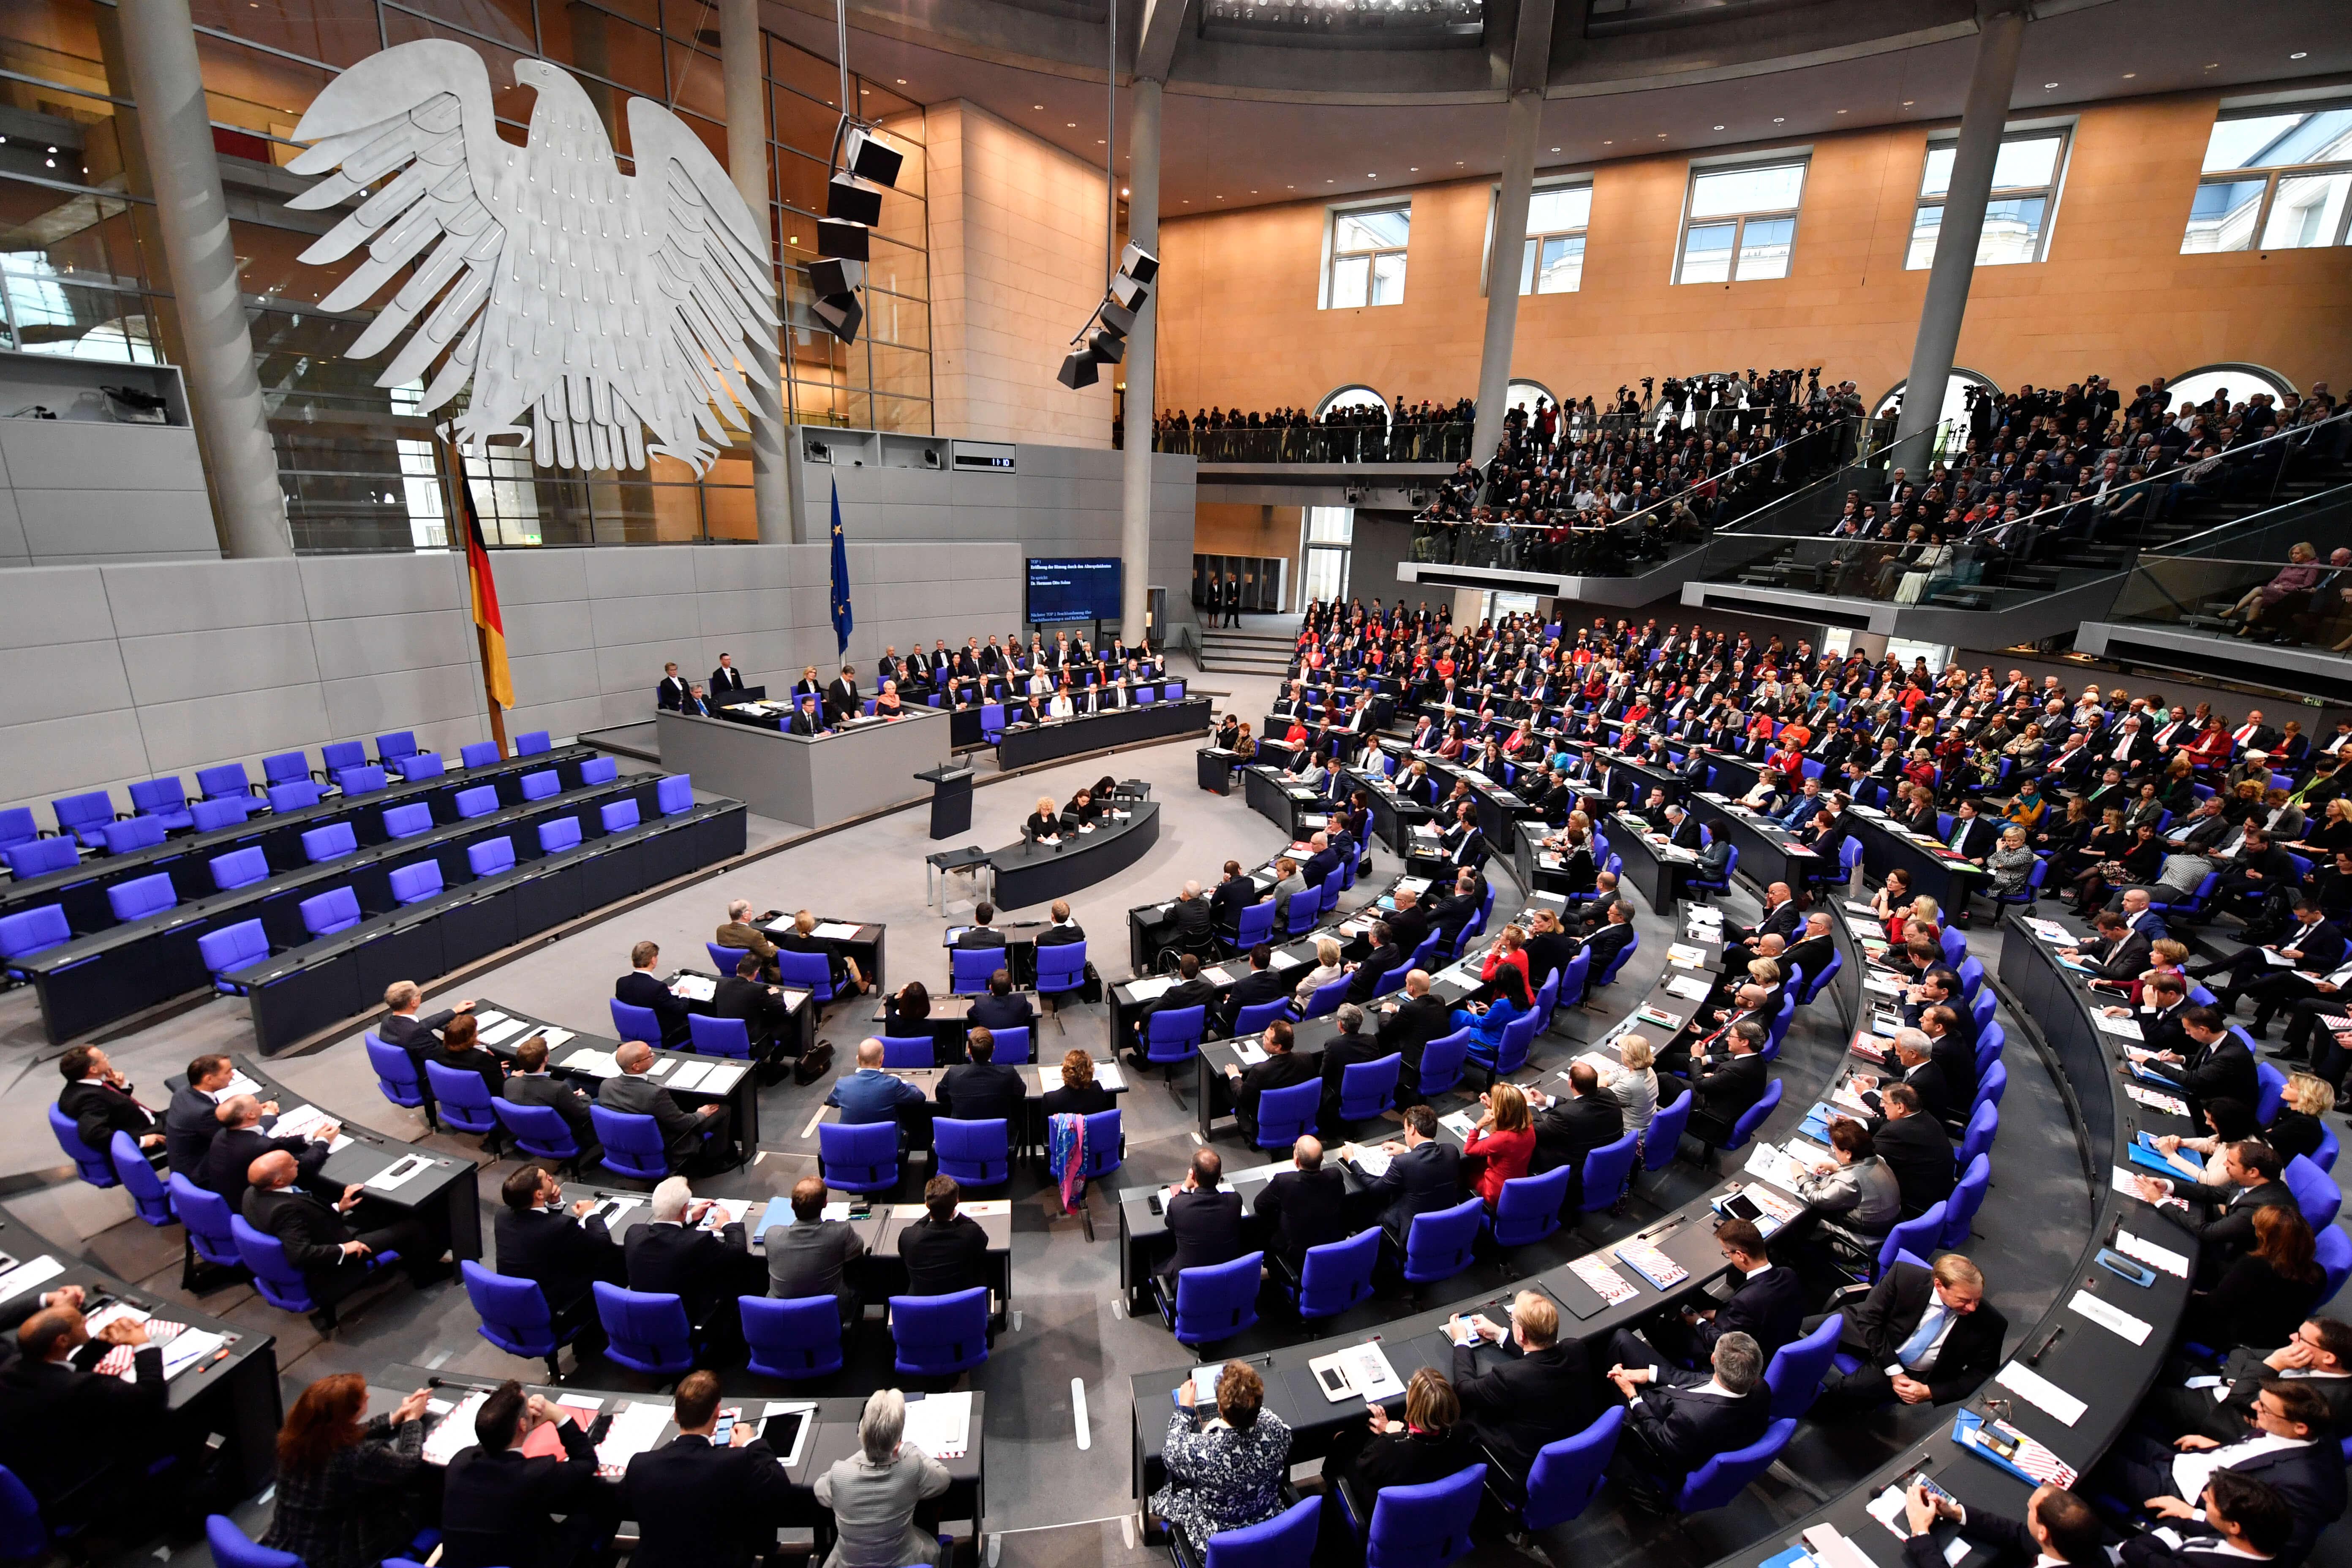 GERMANY-POLITICS-PARLIAMENT